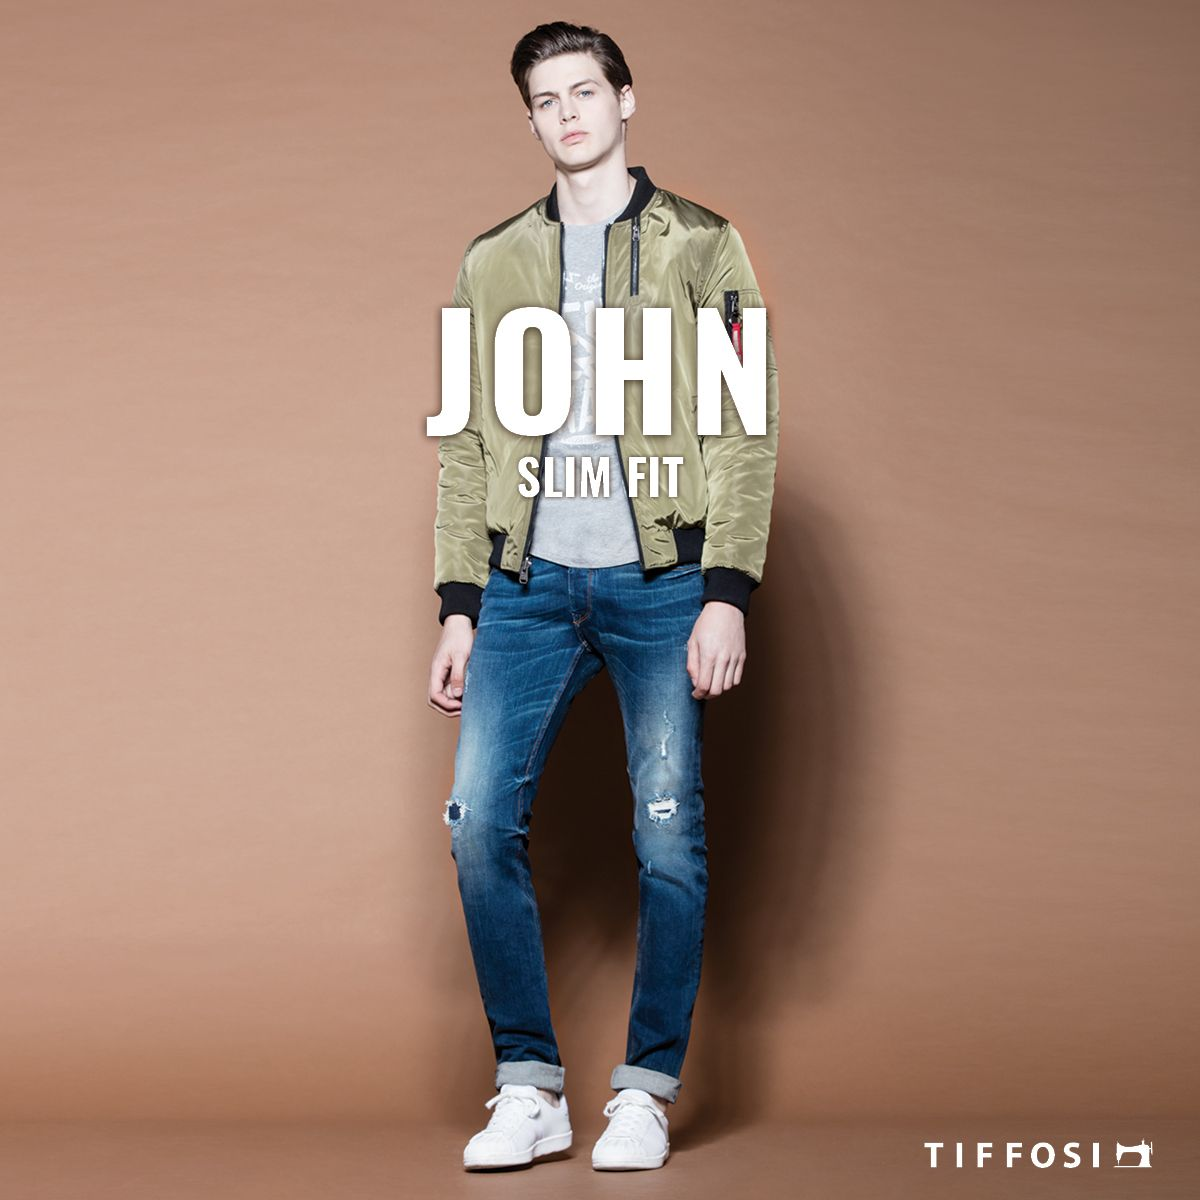 🆕  John - Slim Fit 🆕  #tiffosi #tiffosidenim #newin #fit #fitguide #denim #denimguide #denimcollection #jeans